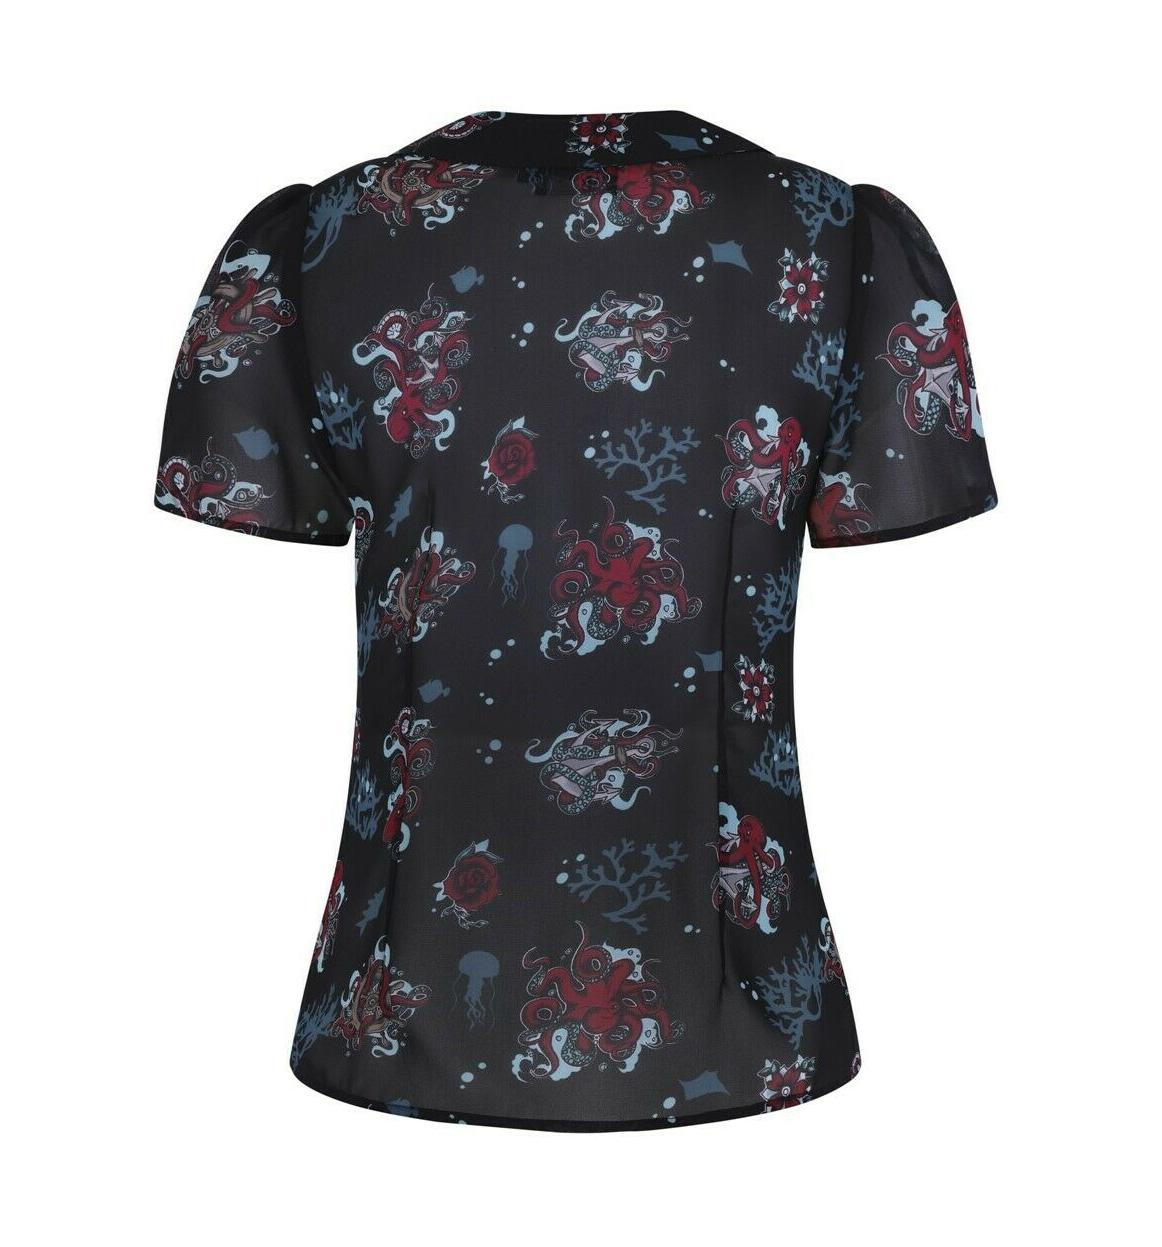 Hell-Bunny-50s-Shirt-Top-Black-Ocean-Octopus-Roses-POSEIDON-Blouse-All-Sizes thumbnail 25